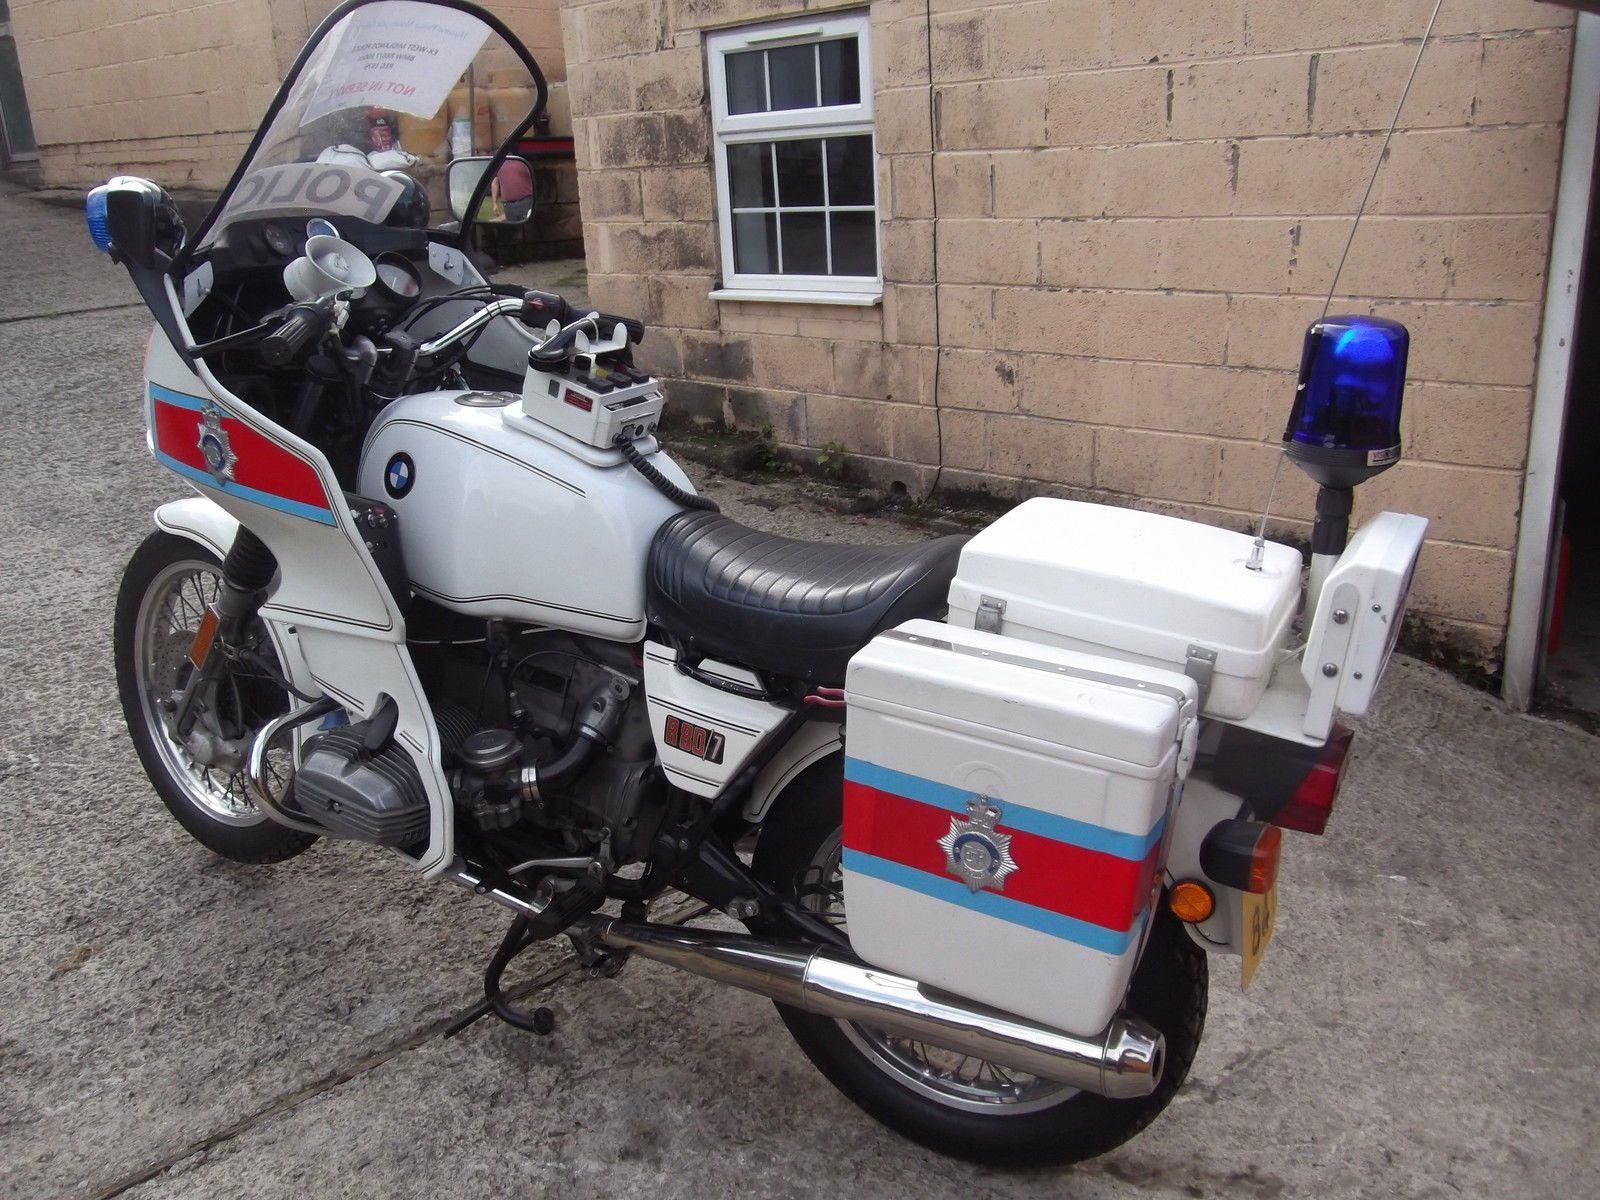 medium resolution of 1979 bmw r80 ex police motorcycle 800cc restored good runner poss film work ebay